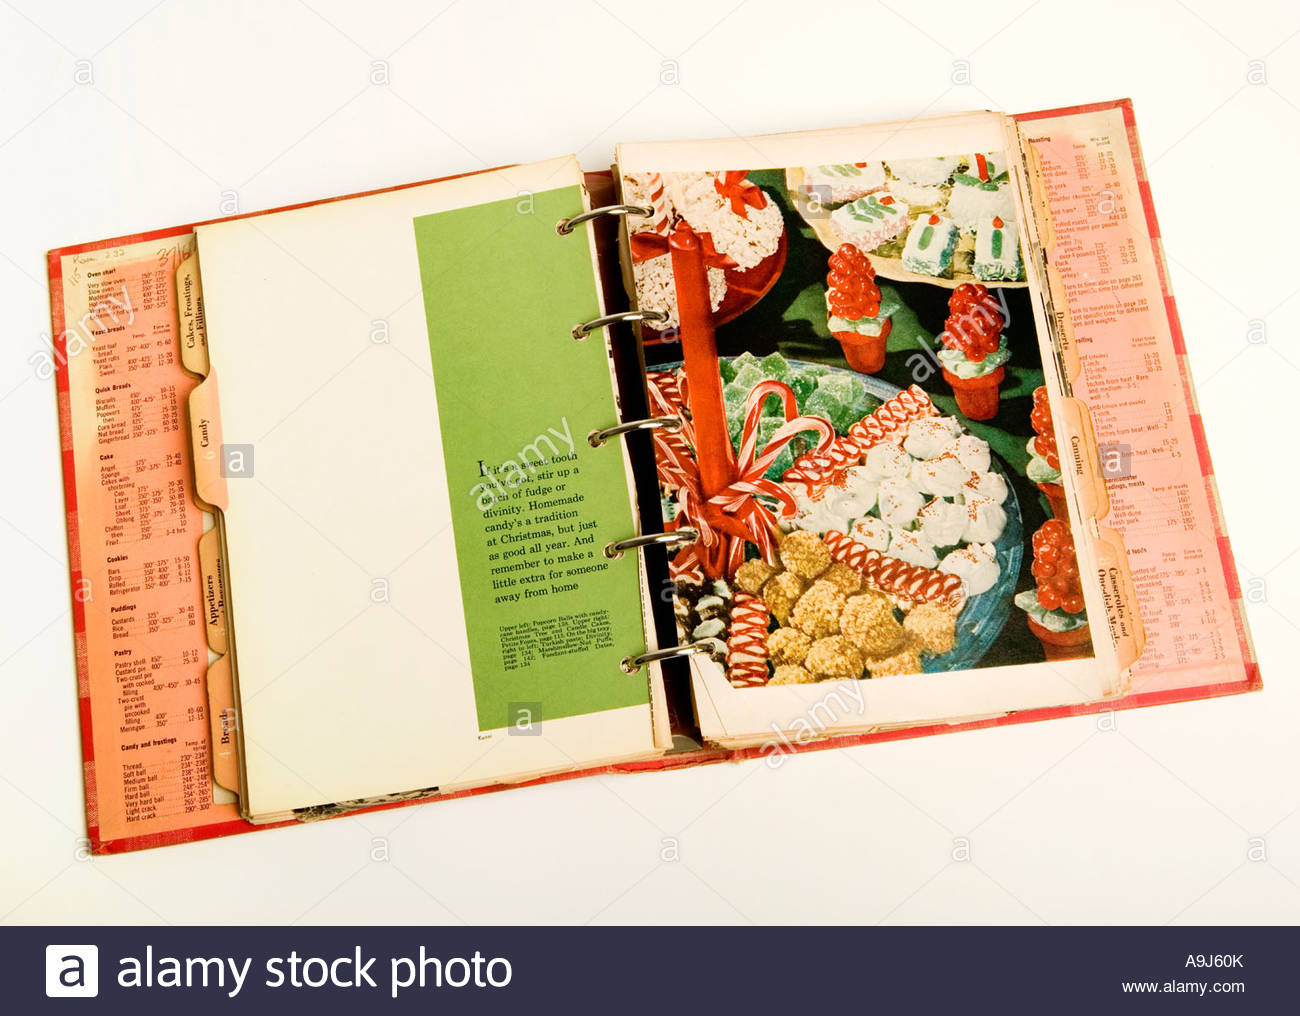 1950s recipe book - Stock Image